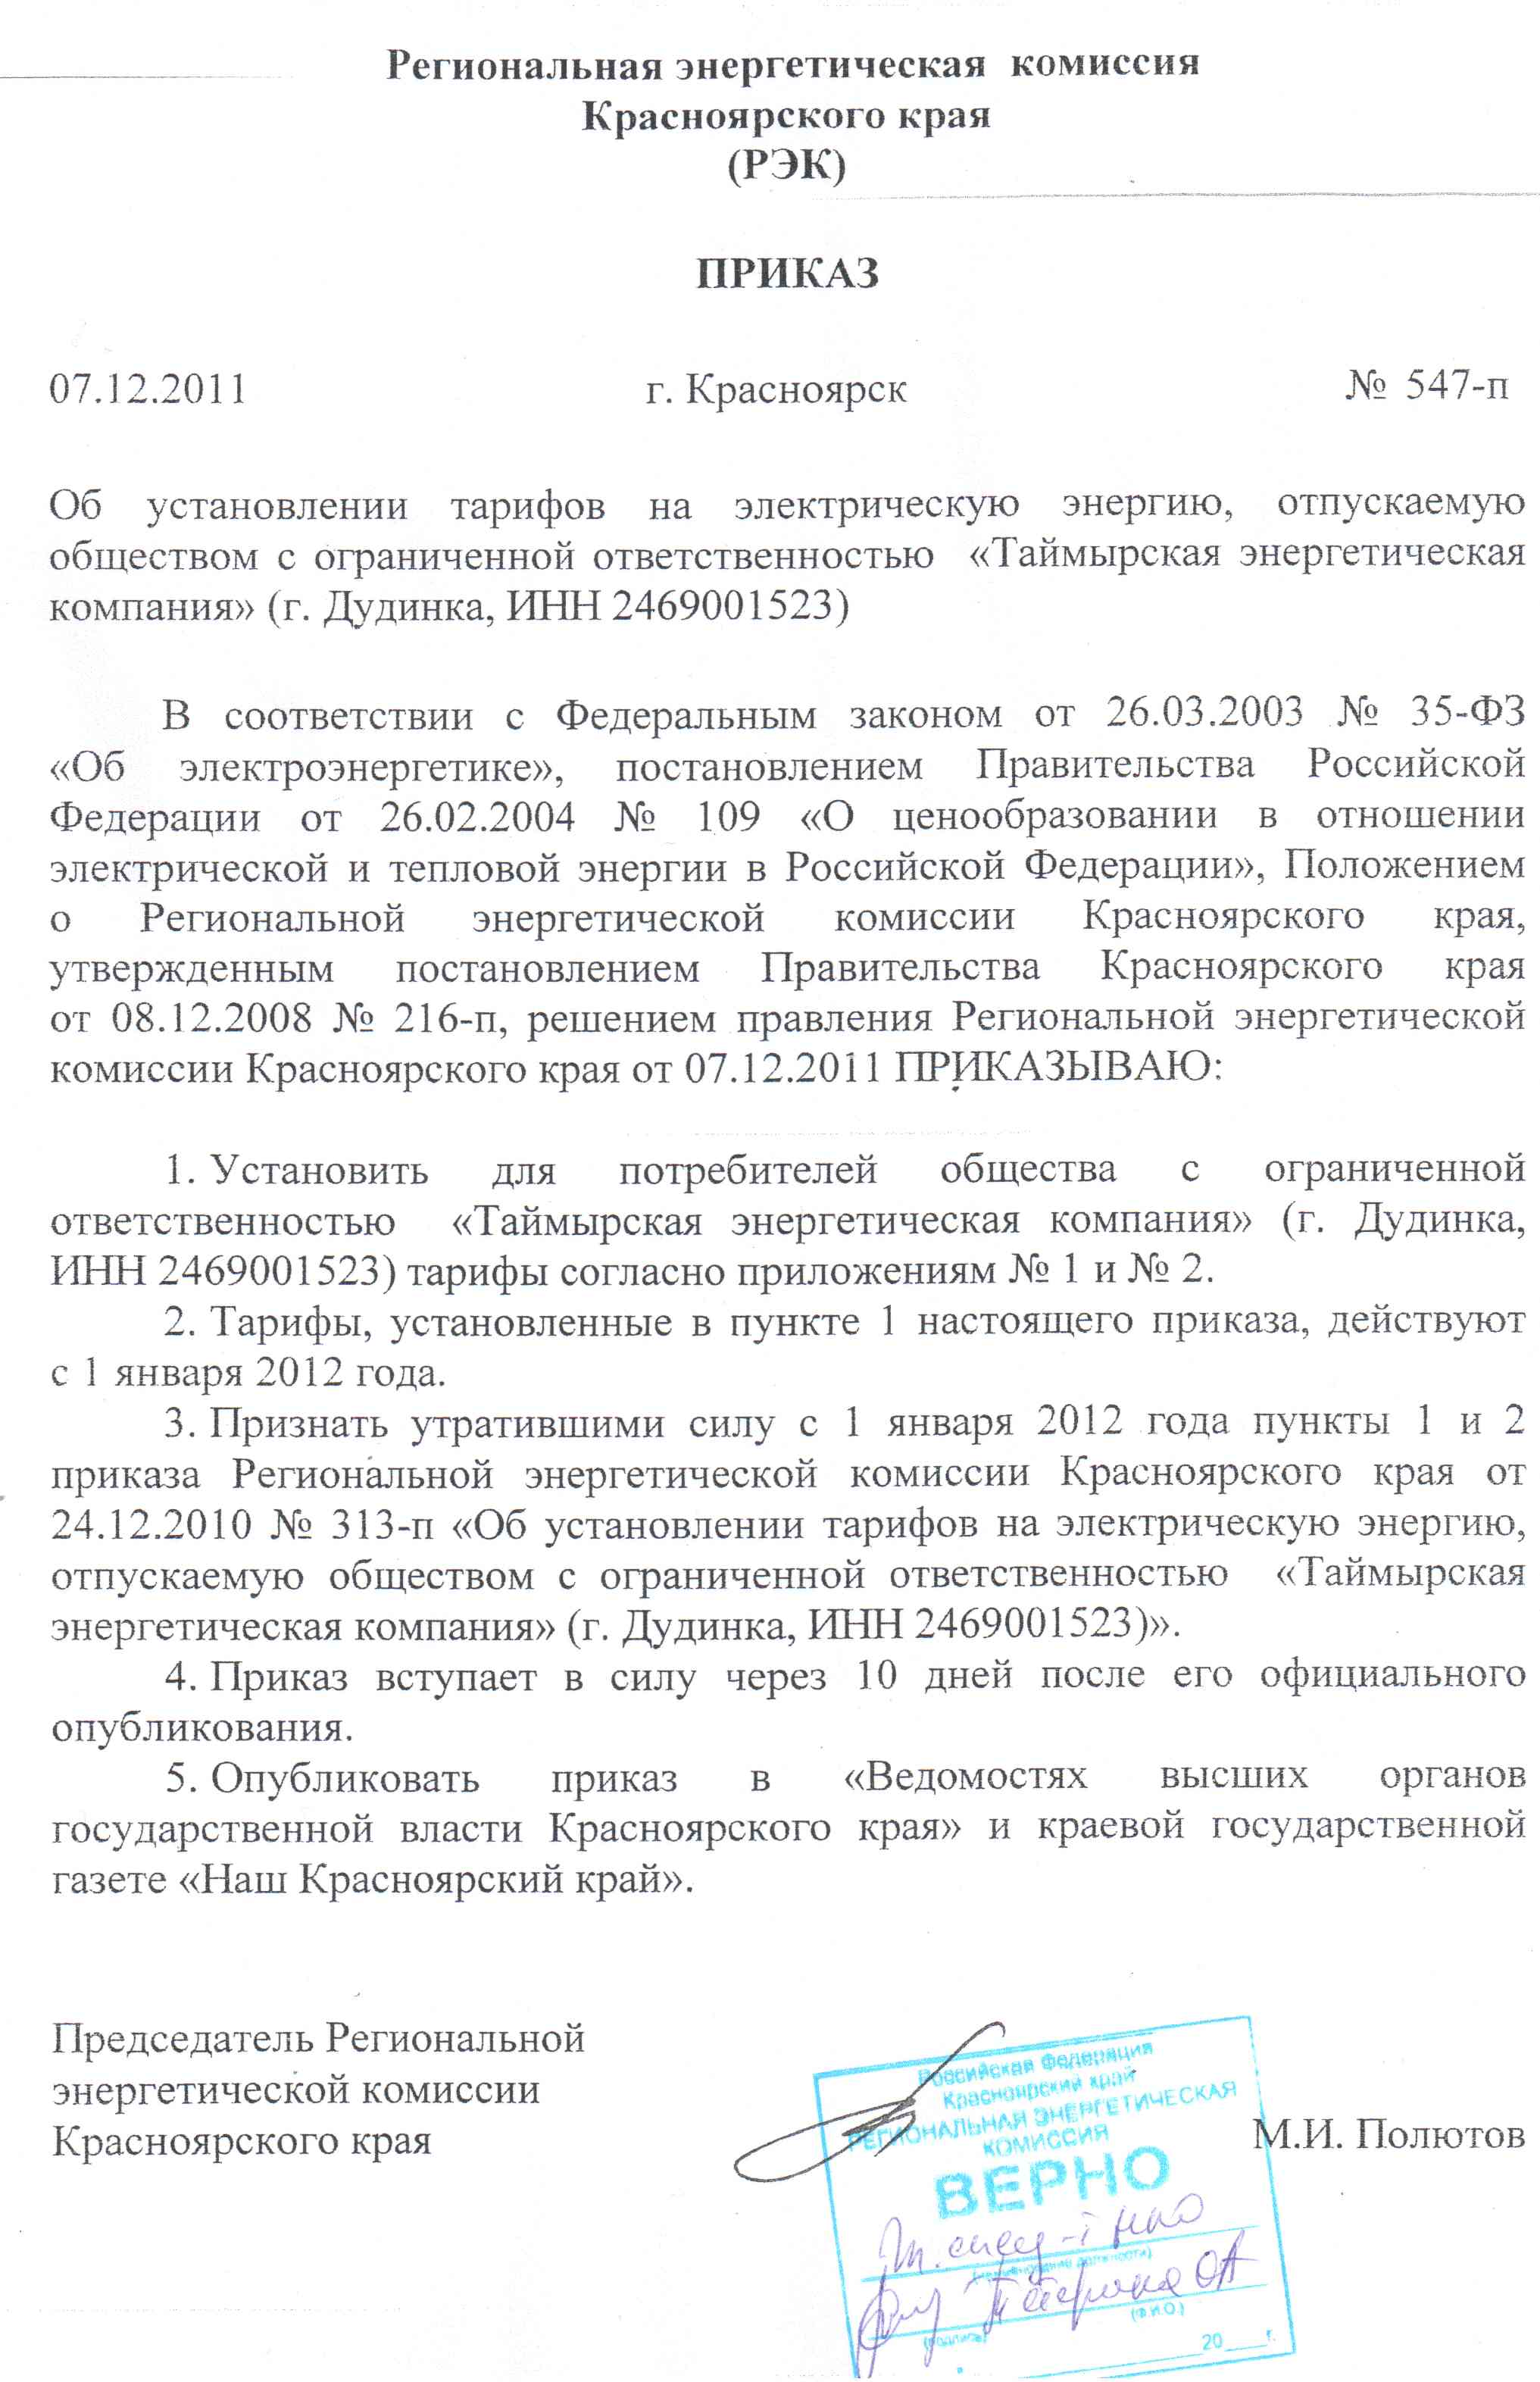 постановление 547-п от 20.11.2013